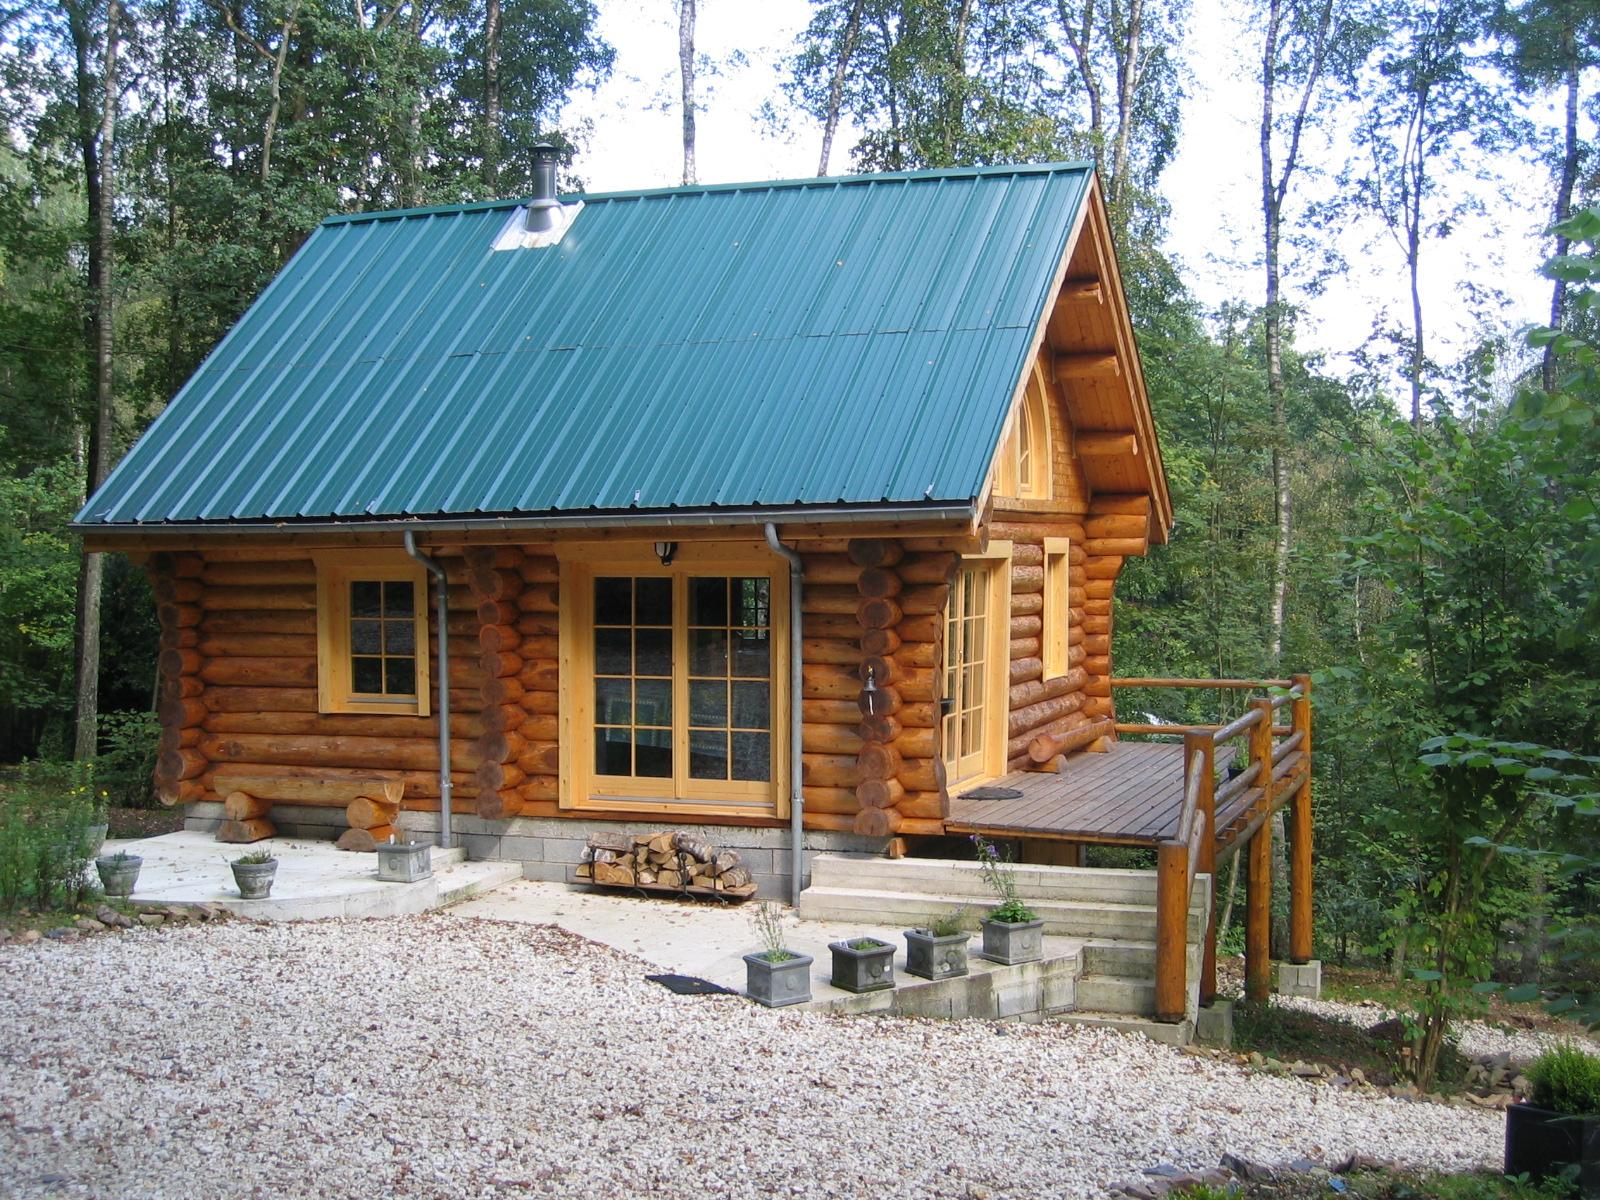 Case din lemn rotund NATURAL LIVING - Poza 2